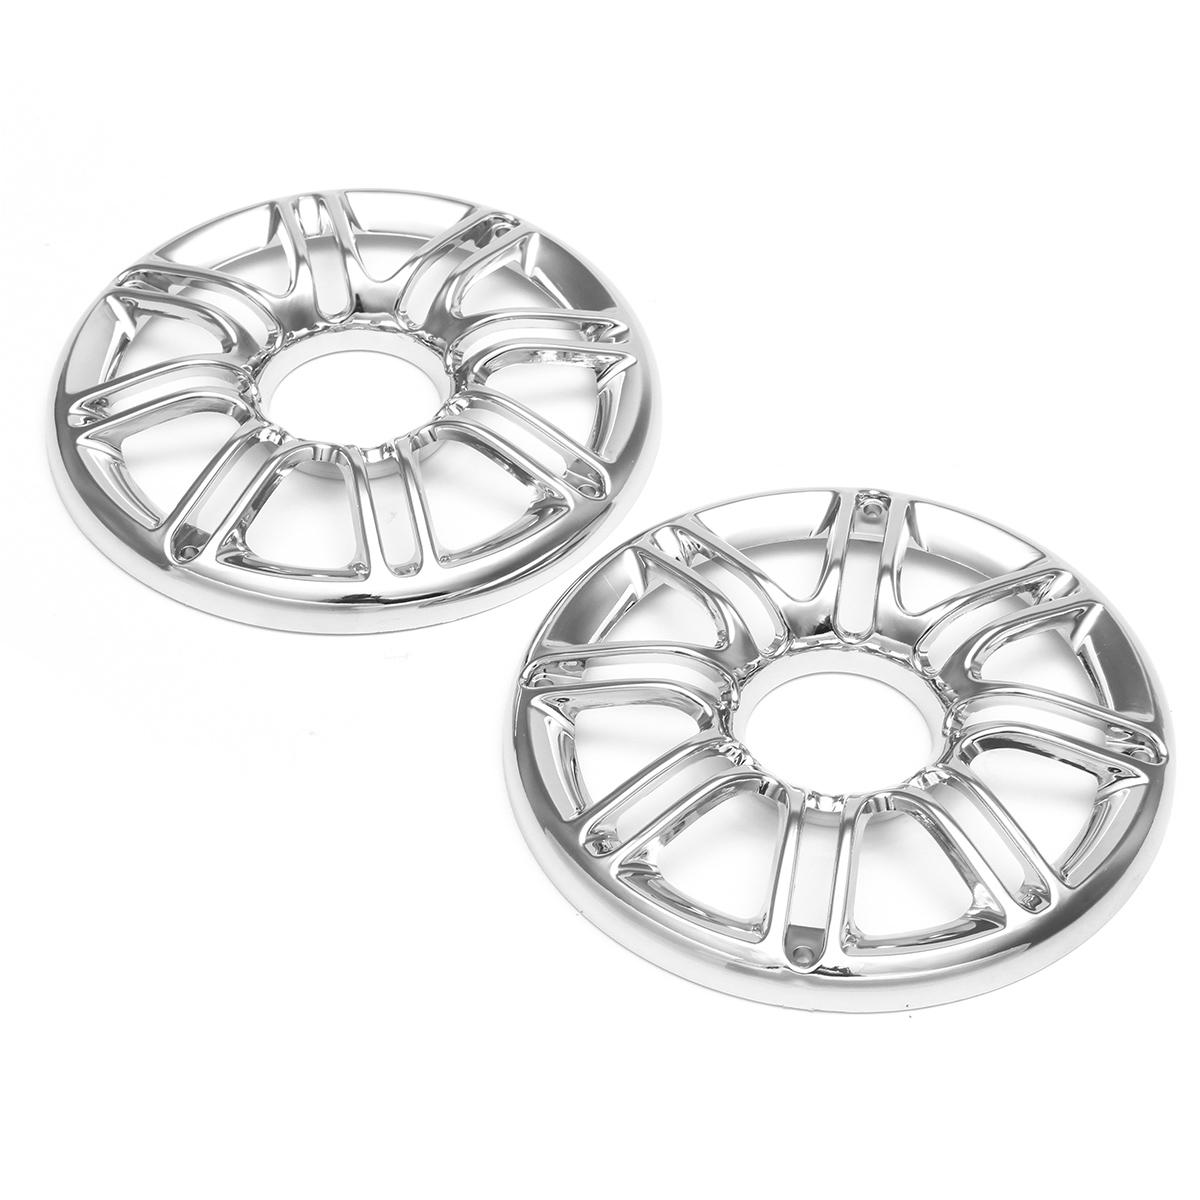 Pair plate brust speaker trim grill cover chrome for